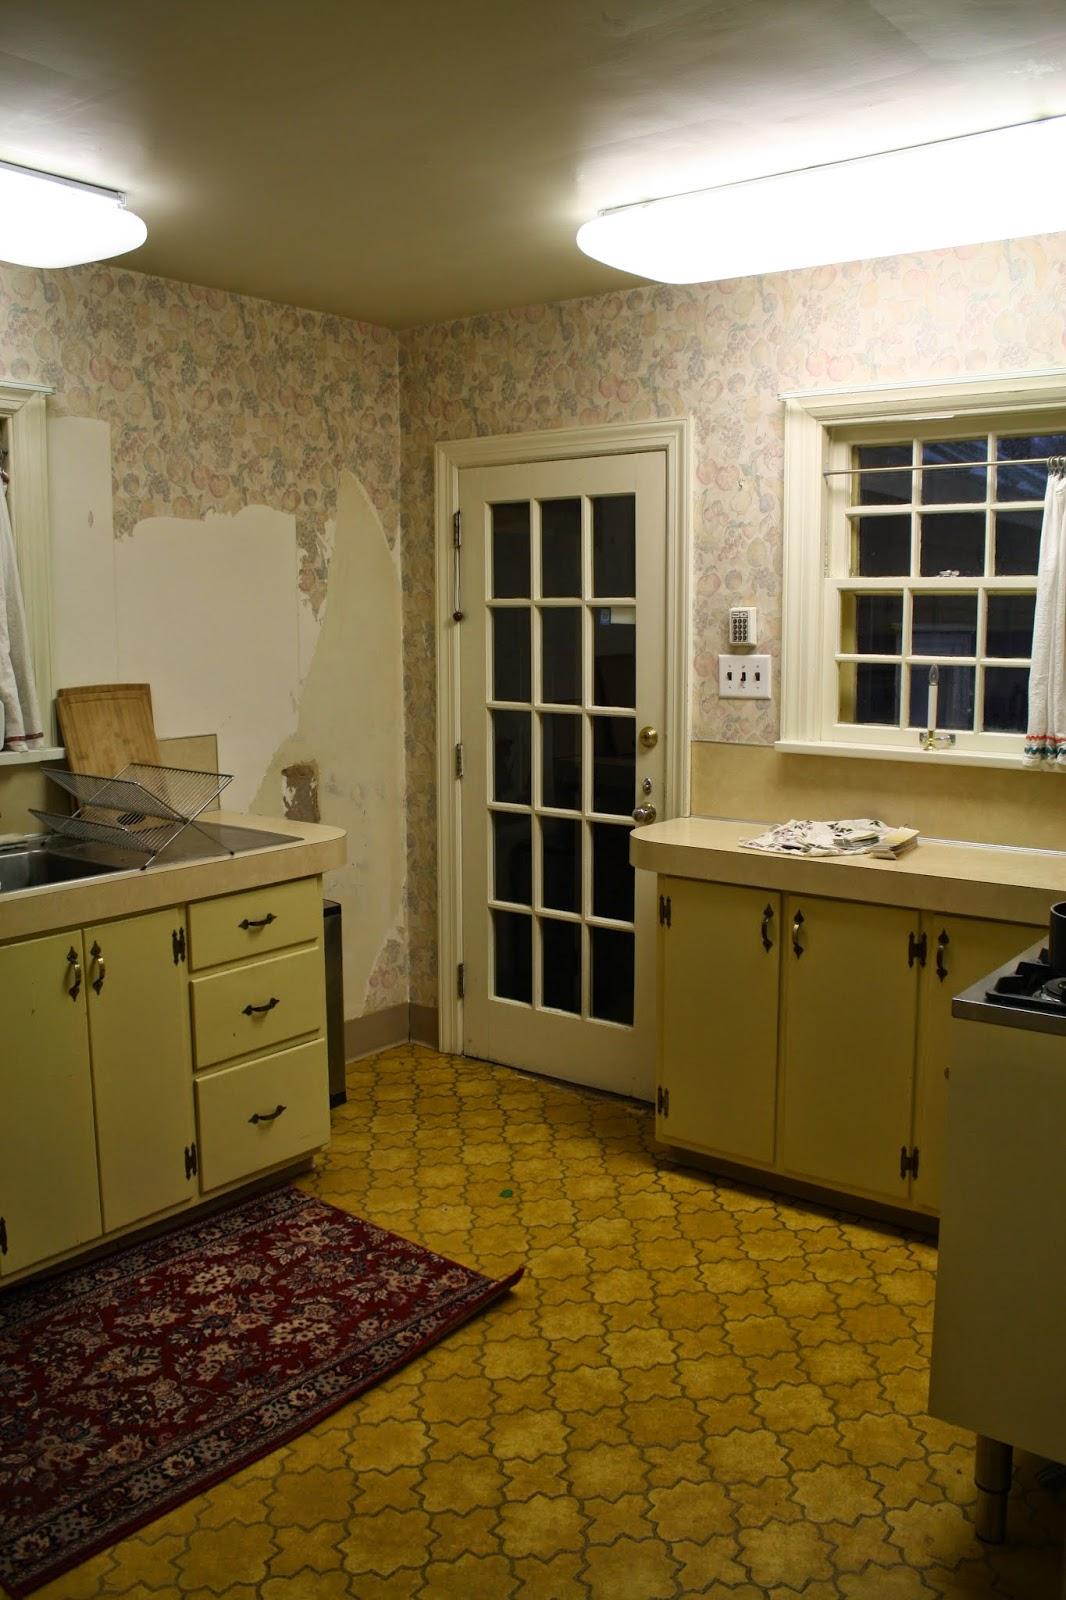 Removing Linoleum - Scraping Up Linoleum - Restoring Wood Floors